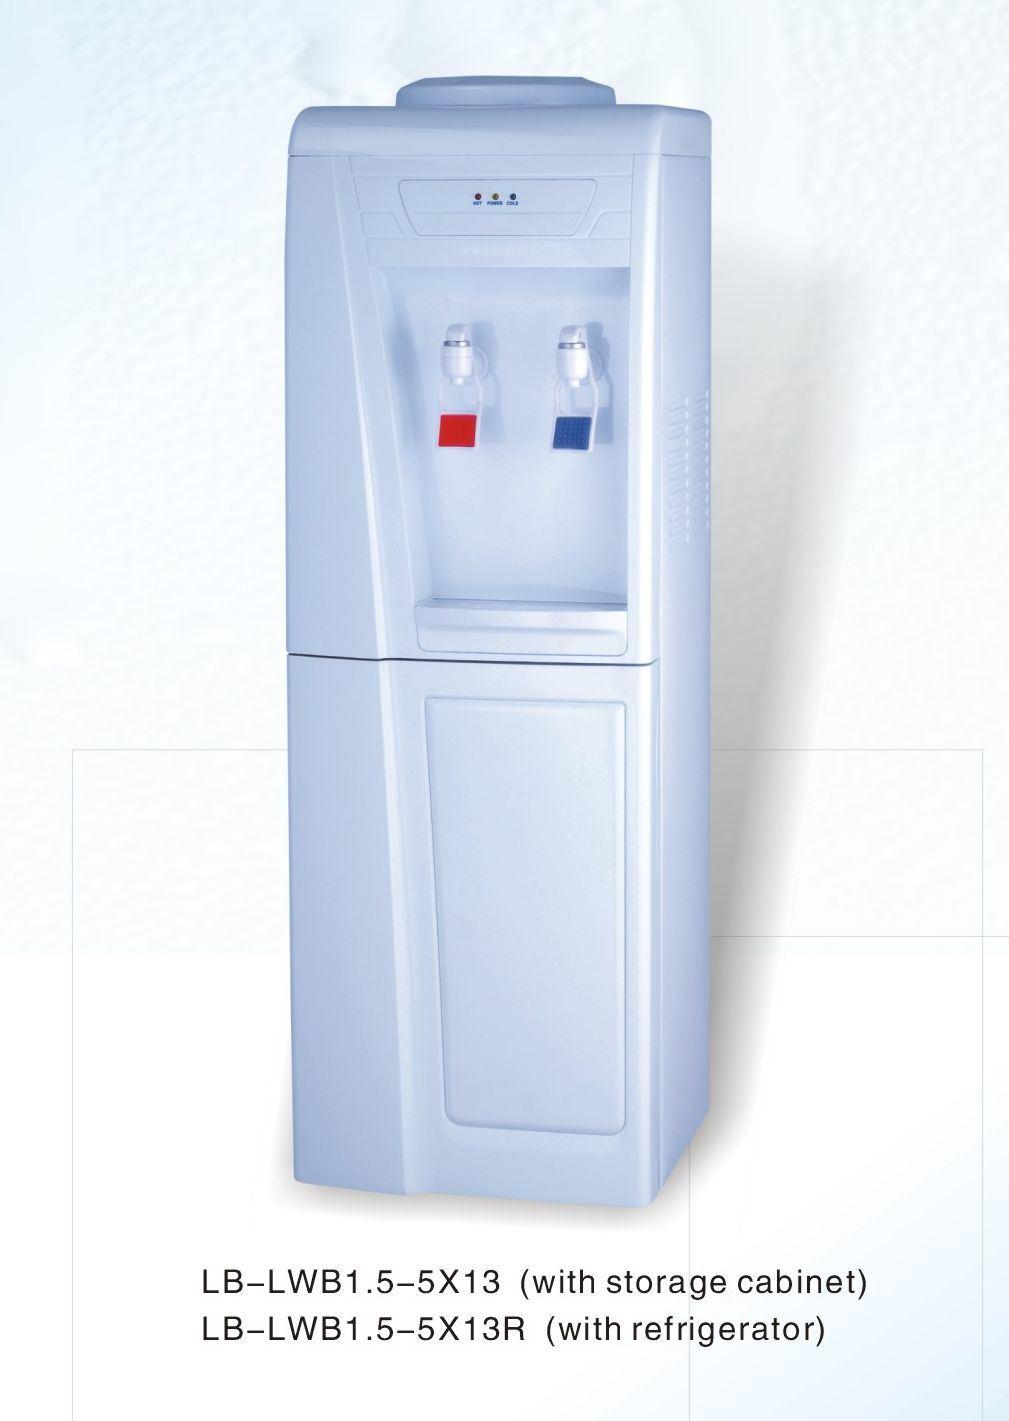 Countertop Ice Maker Plumbed : Home Water Cooler Dispenser - Bing images